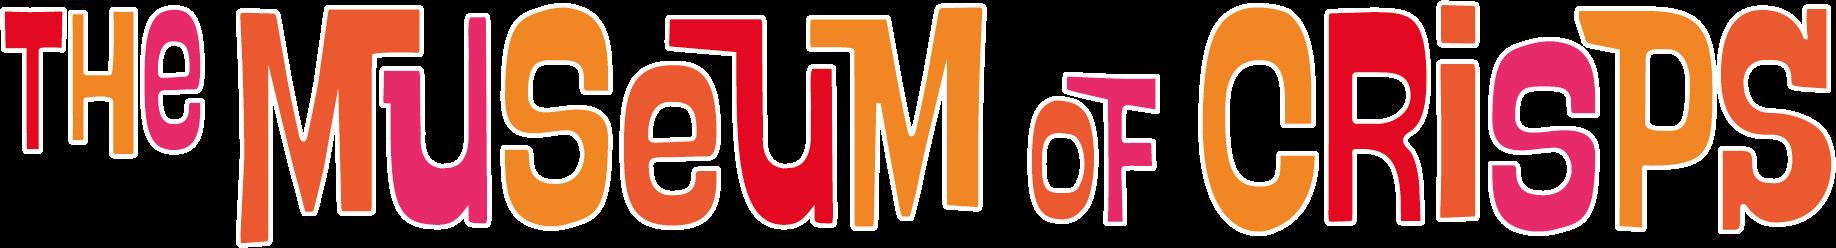 Museum of Crisps logo